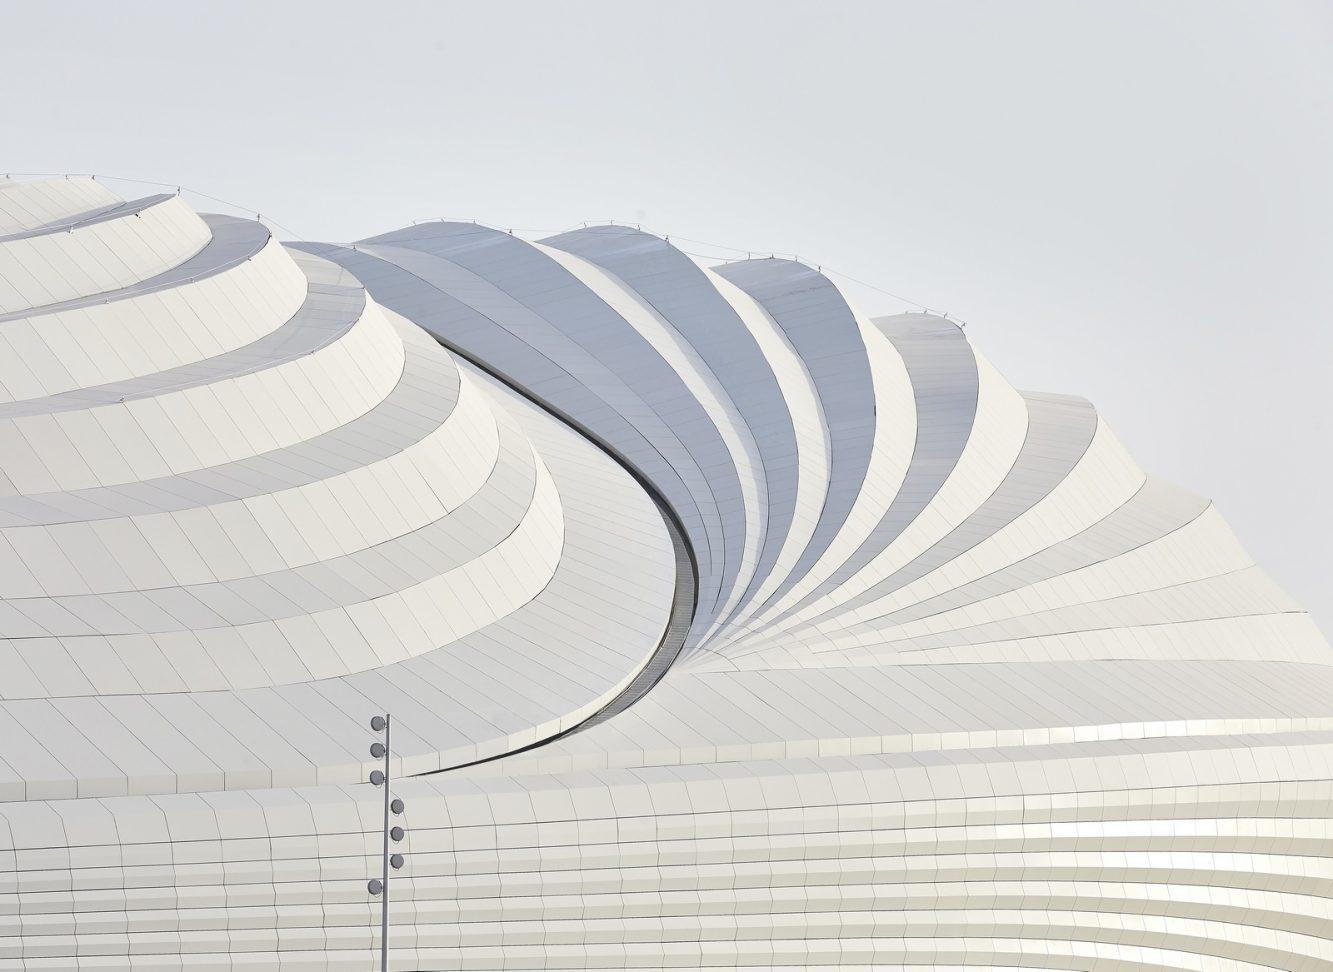 01_ZHA_Al Wakrah Stadium_Qatar_©Hufton+Crow (Copiar)